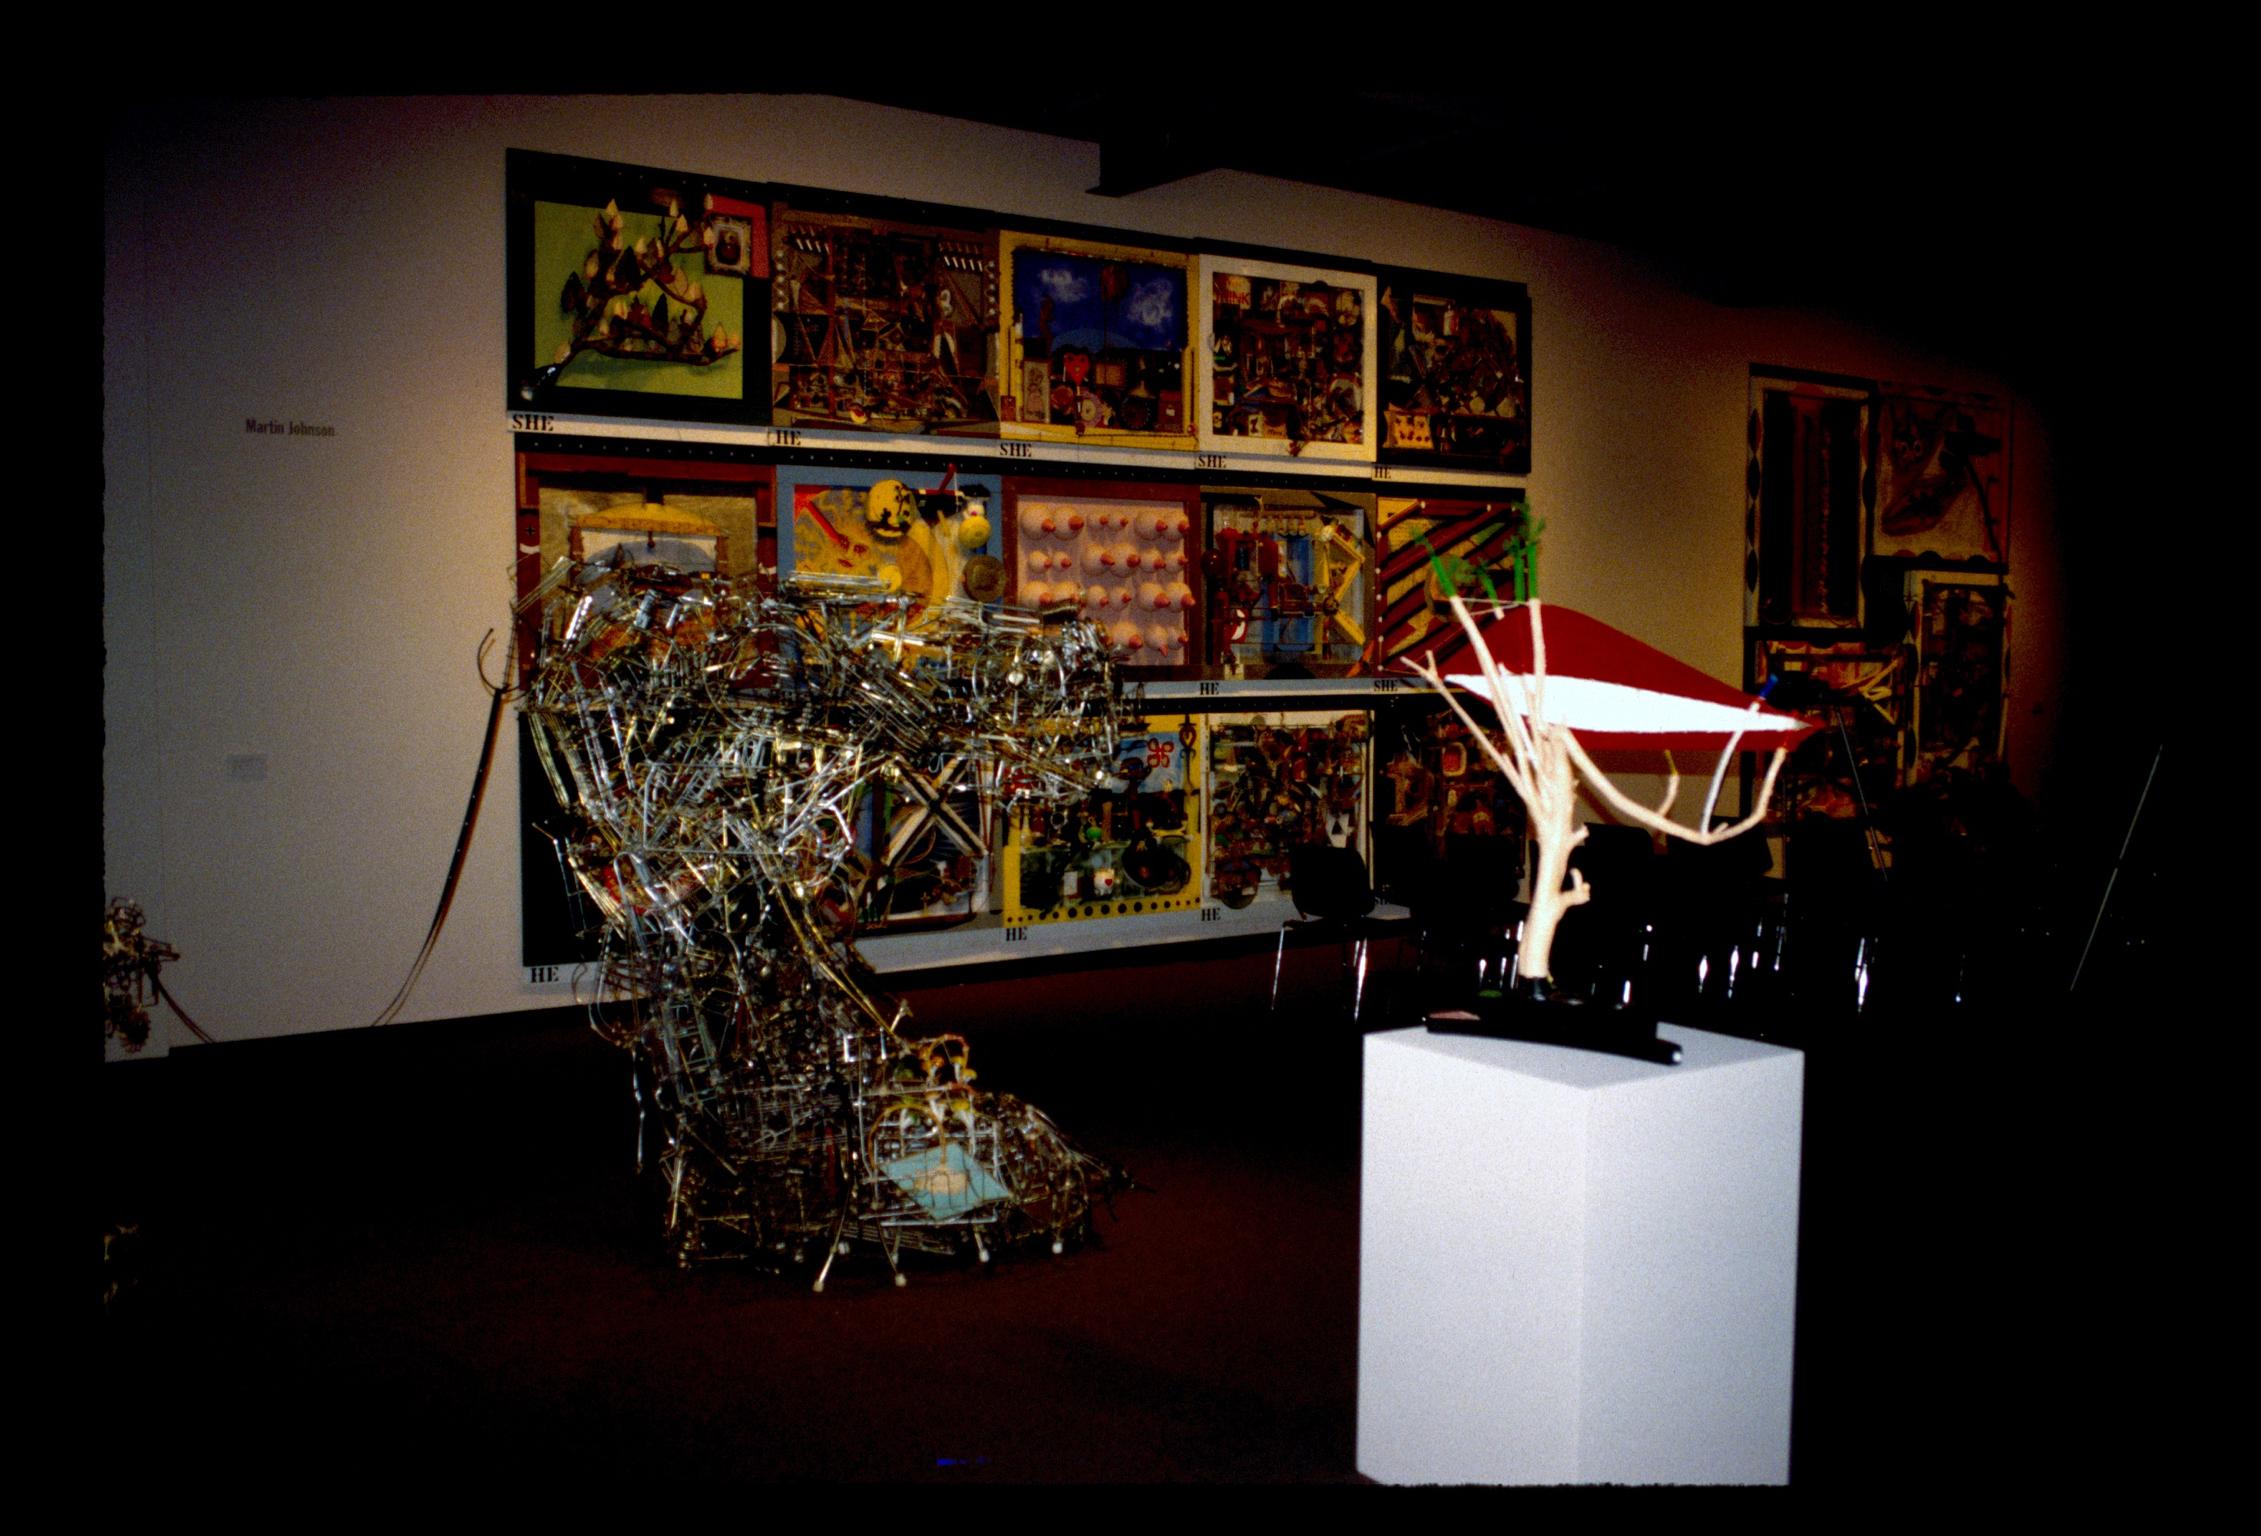 1994-grant show3.jpg